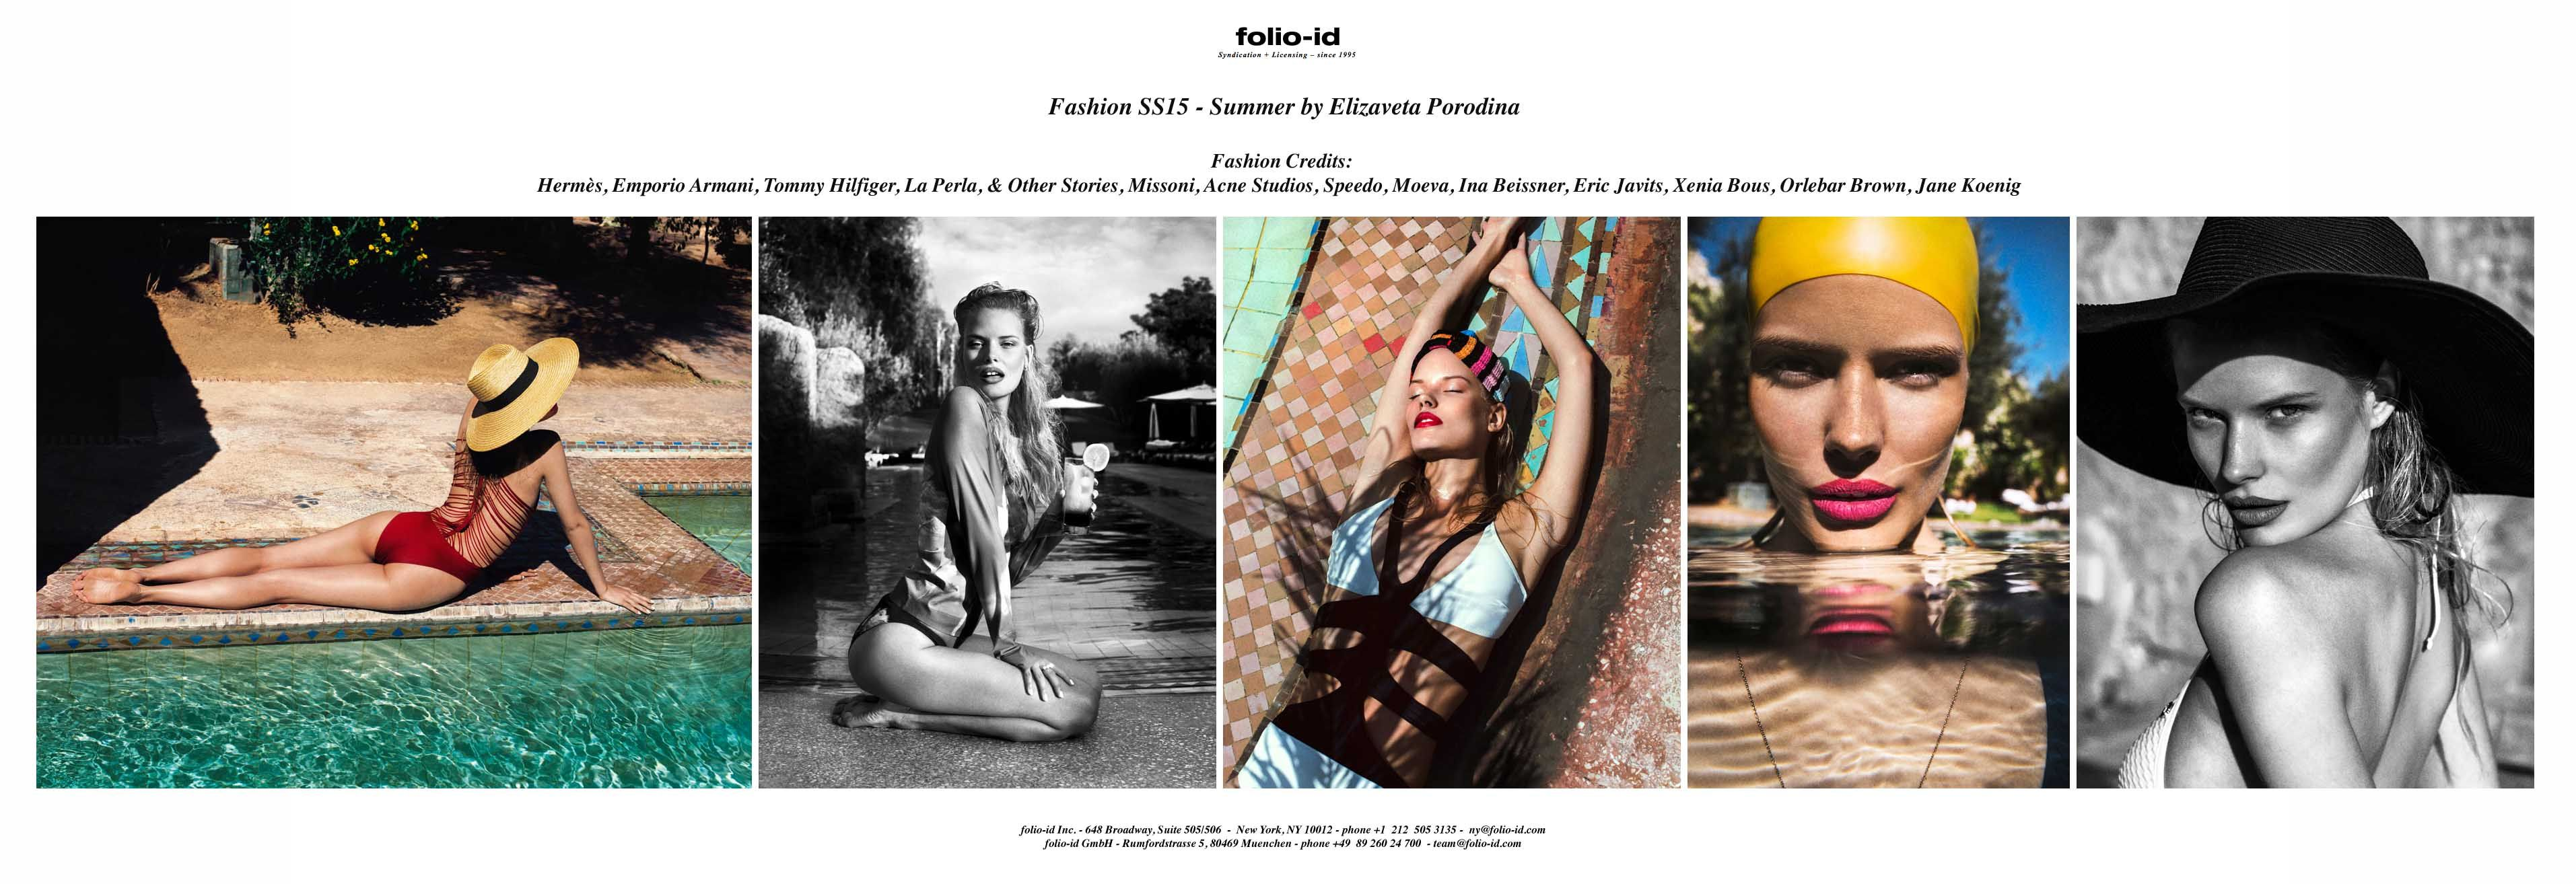 ElizavetaPorodina-folio-id-FashionSS15-Summer-2